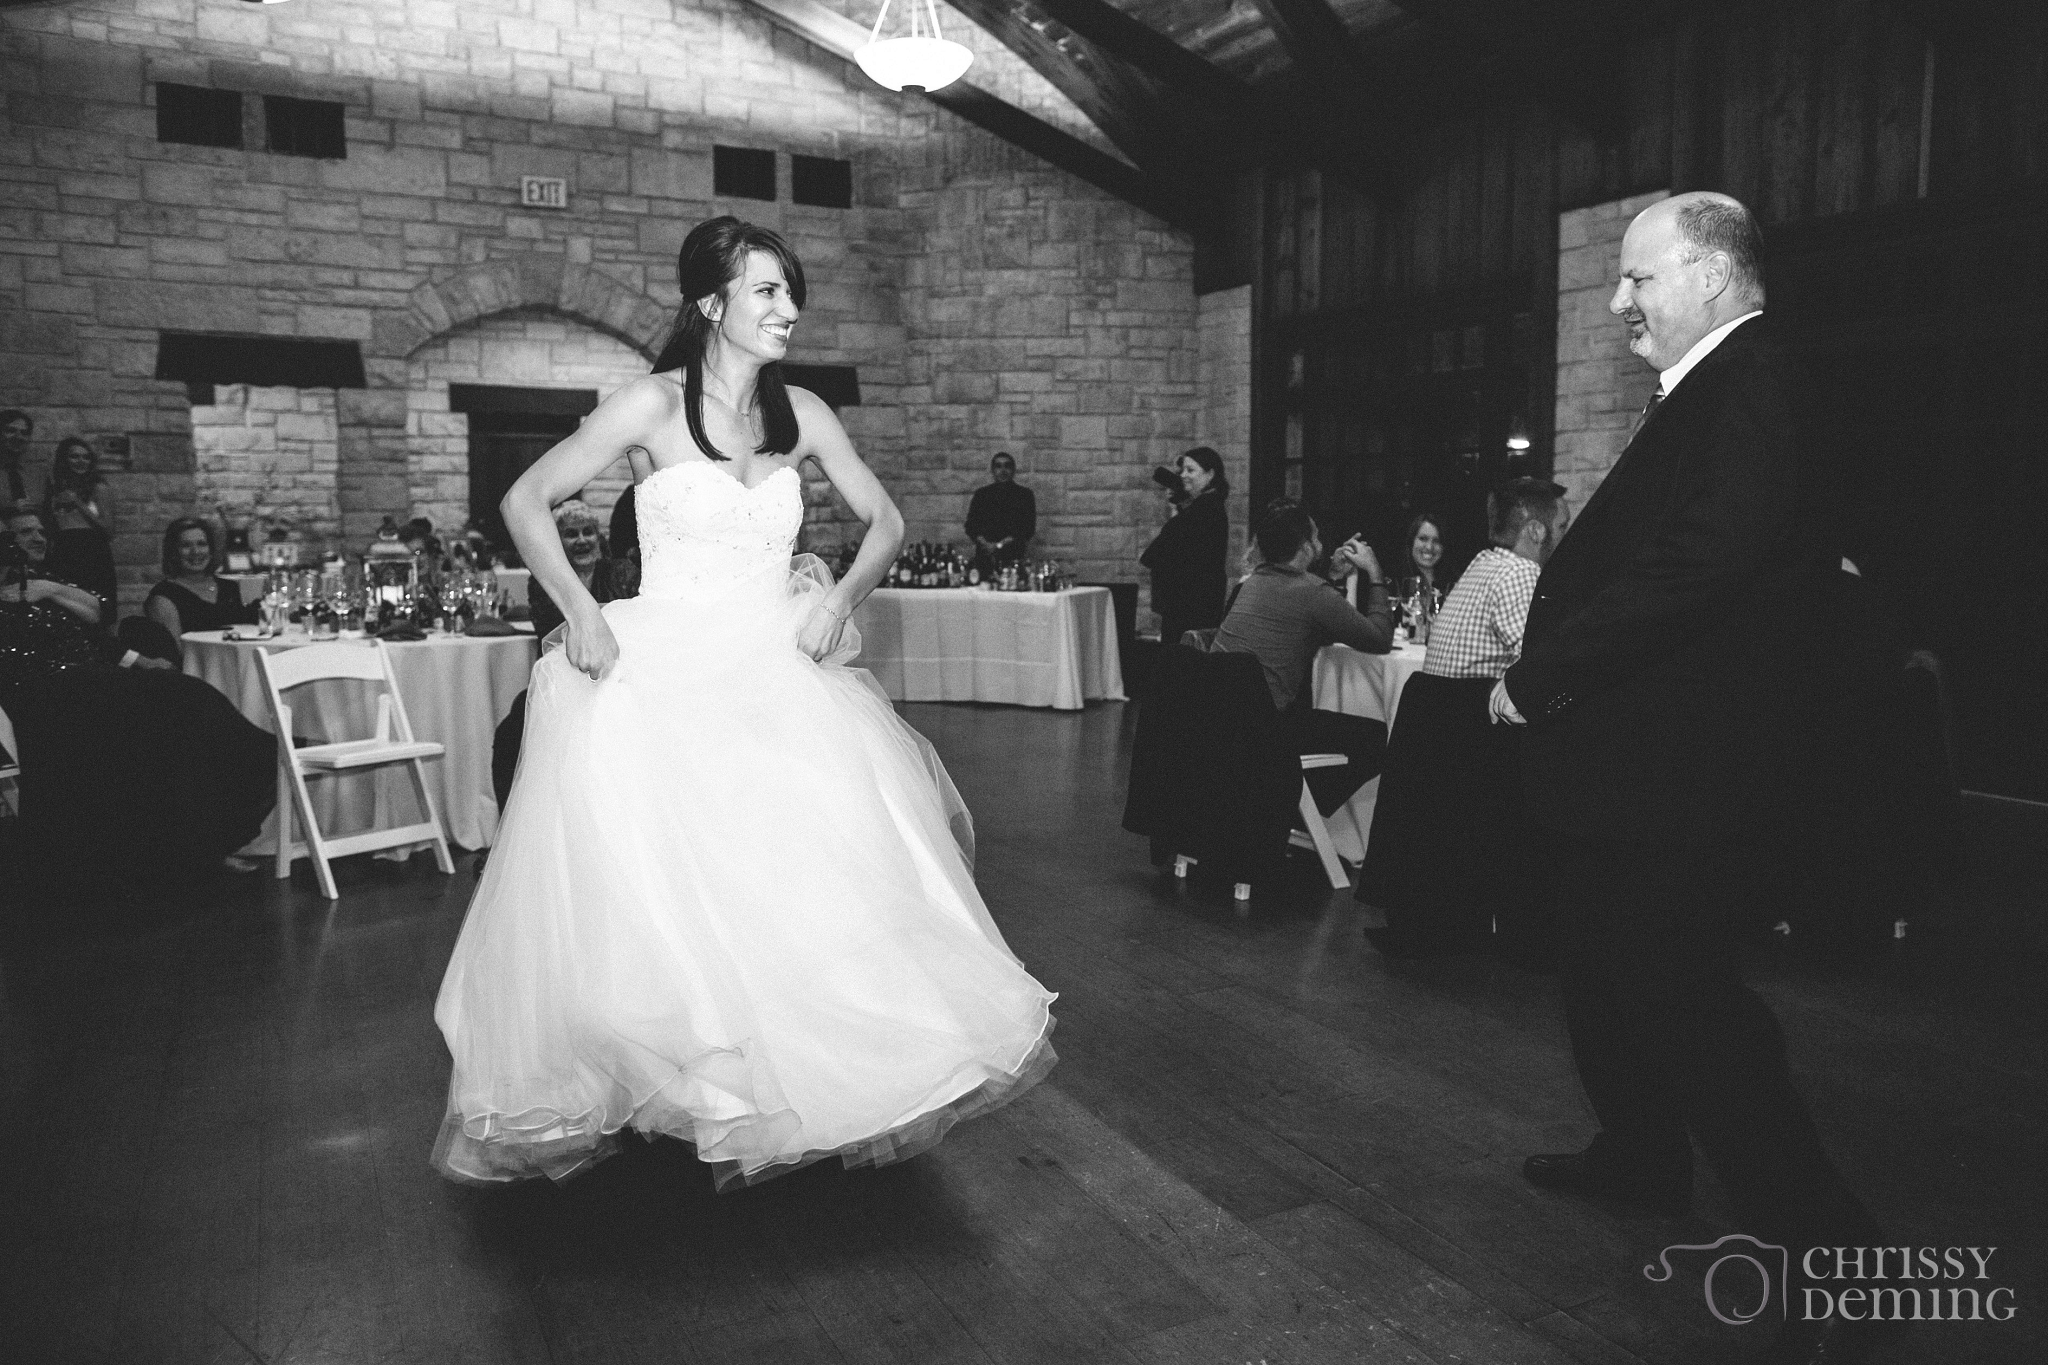 promontory_point_chicago_wedding_photography_0035.jpg